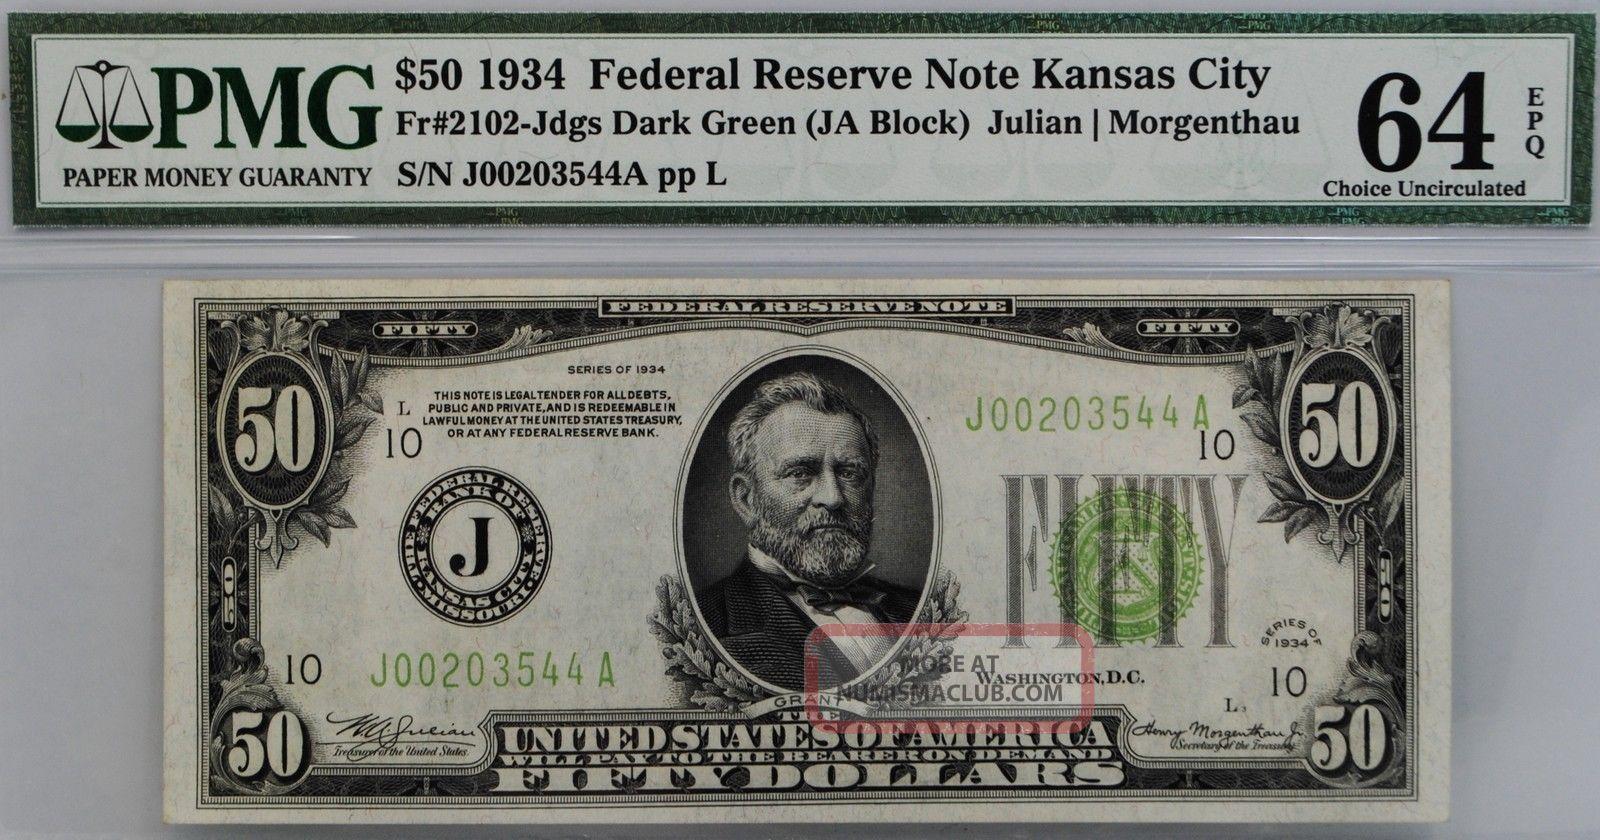 1934 $50 Federal Reserve Note Fr 2102 - Jdgs Bill Kansas City Pmg 64 Epq Ja Block Small Size Notes photo